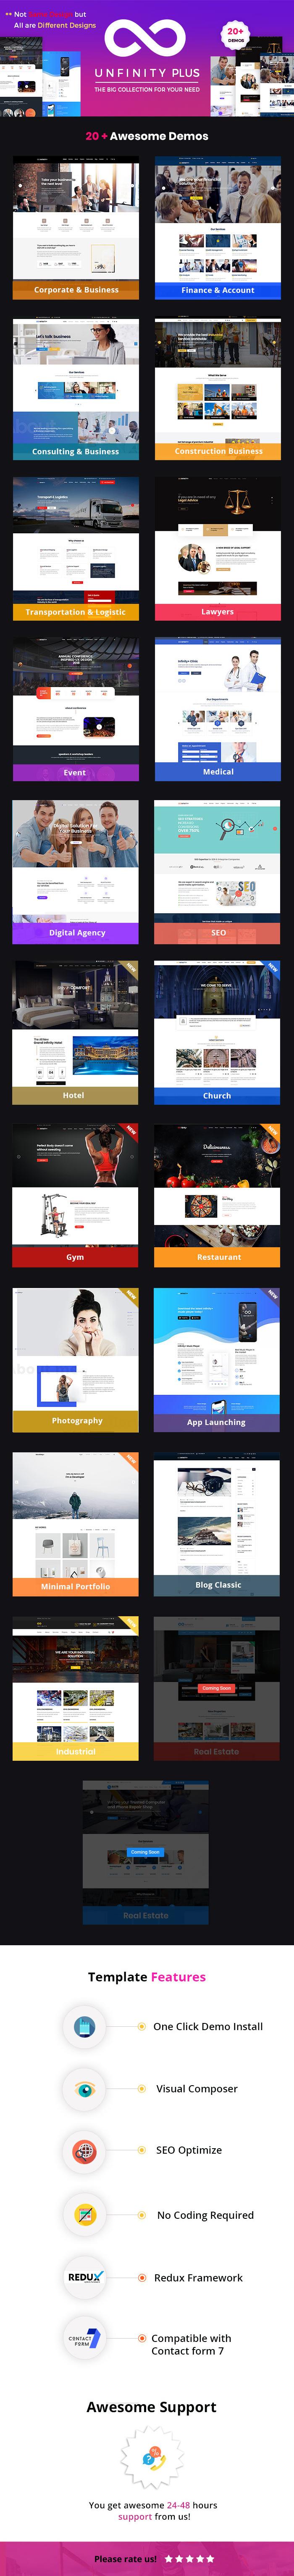 Unfinity Plus - One Page Multi-Purpose WordPress Theme